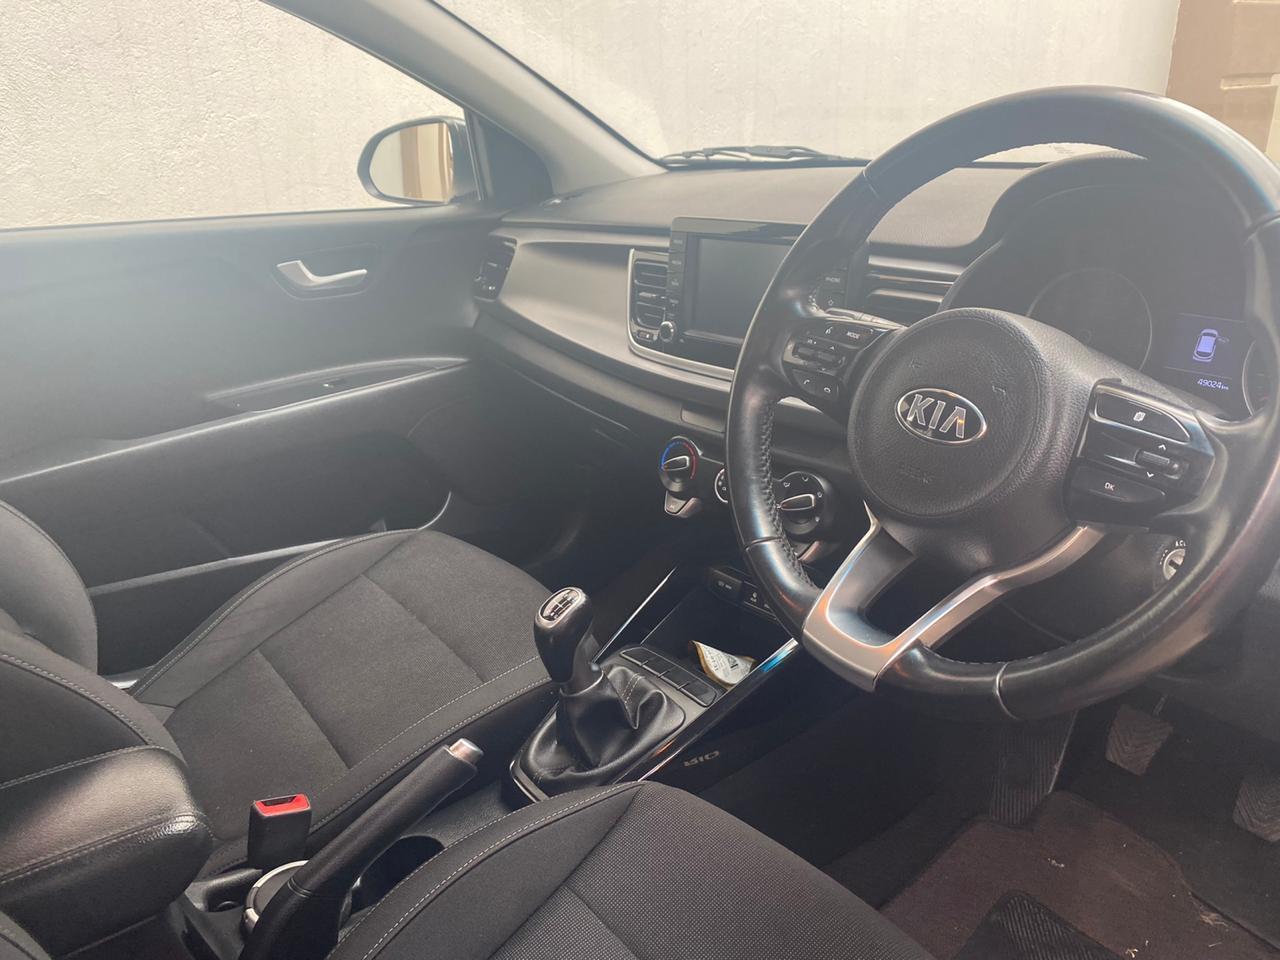 2018 Kia Rio hatch 1.4 EX